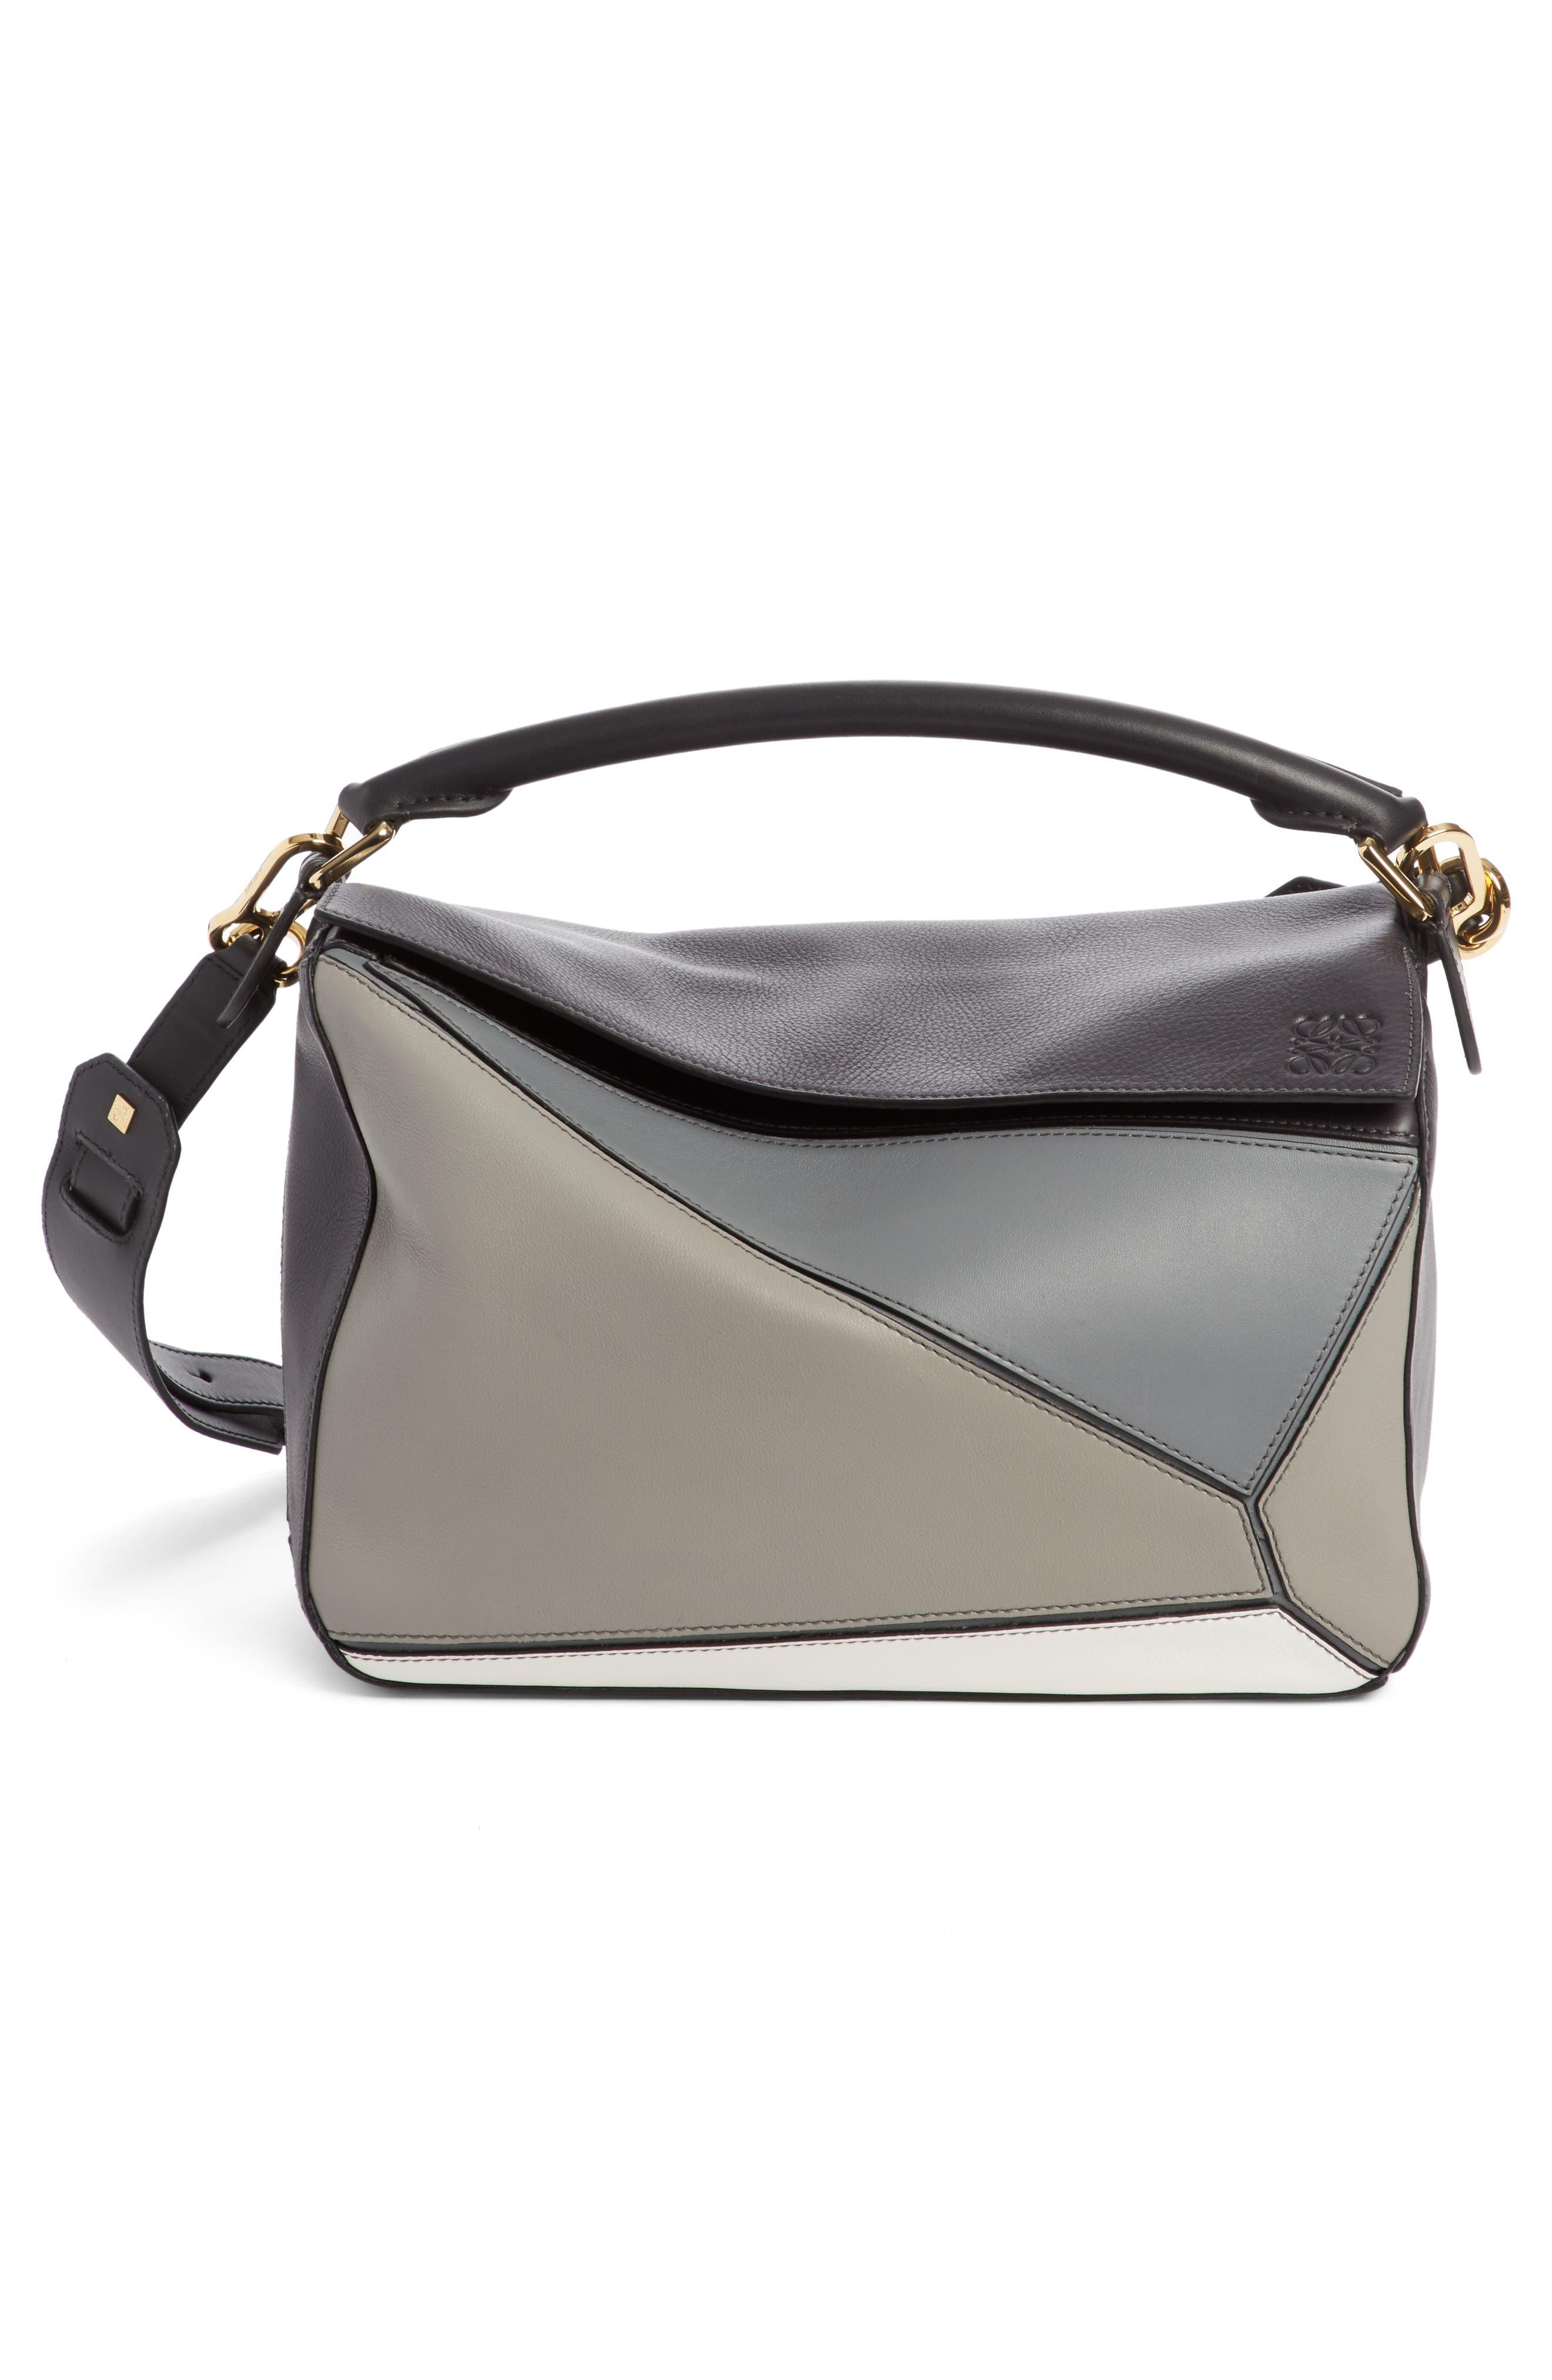 Alternate Image 1 Selected - Loewe Medium Puzzle Colorblock Leather Shoulder Bag